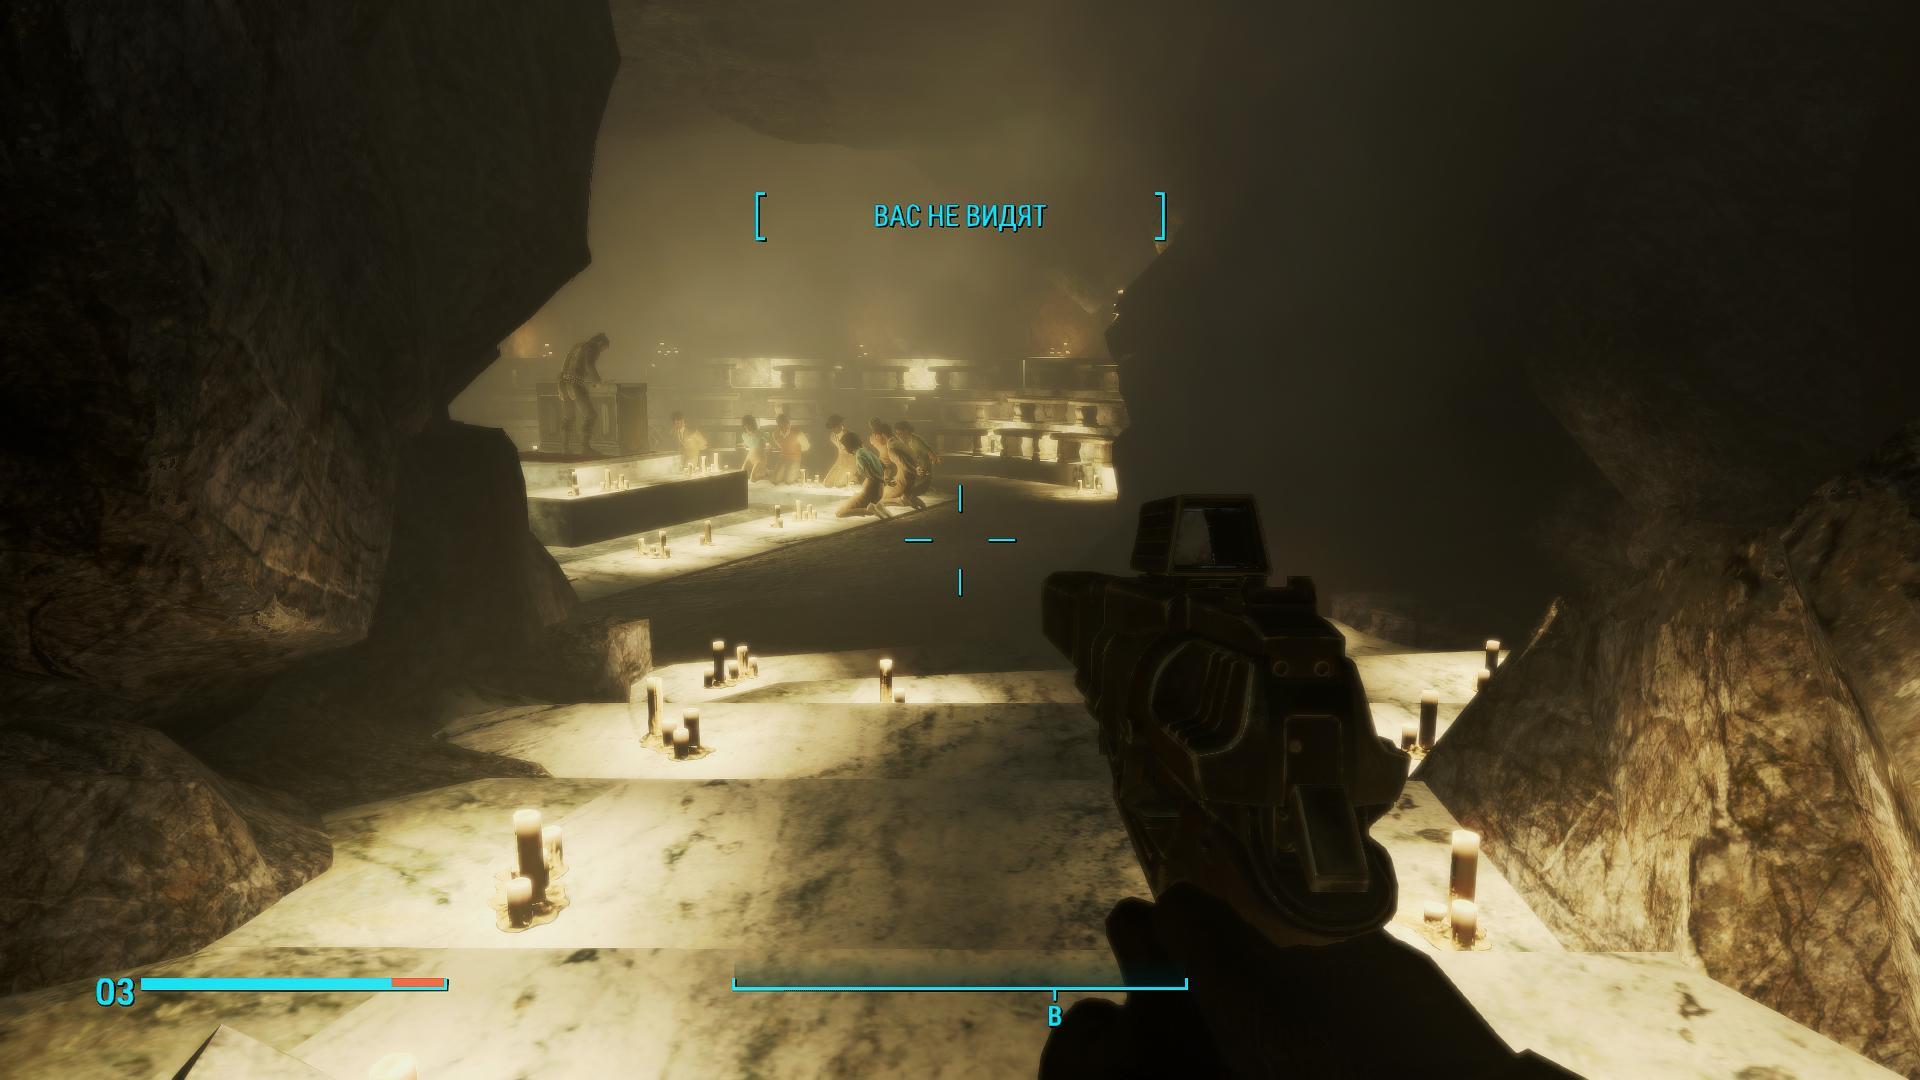 000158.Jpg - Fallout 4